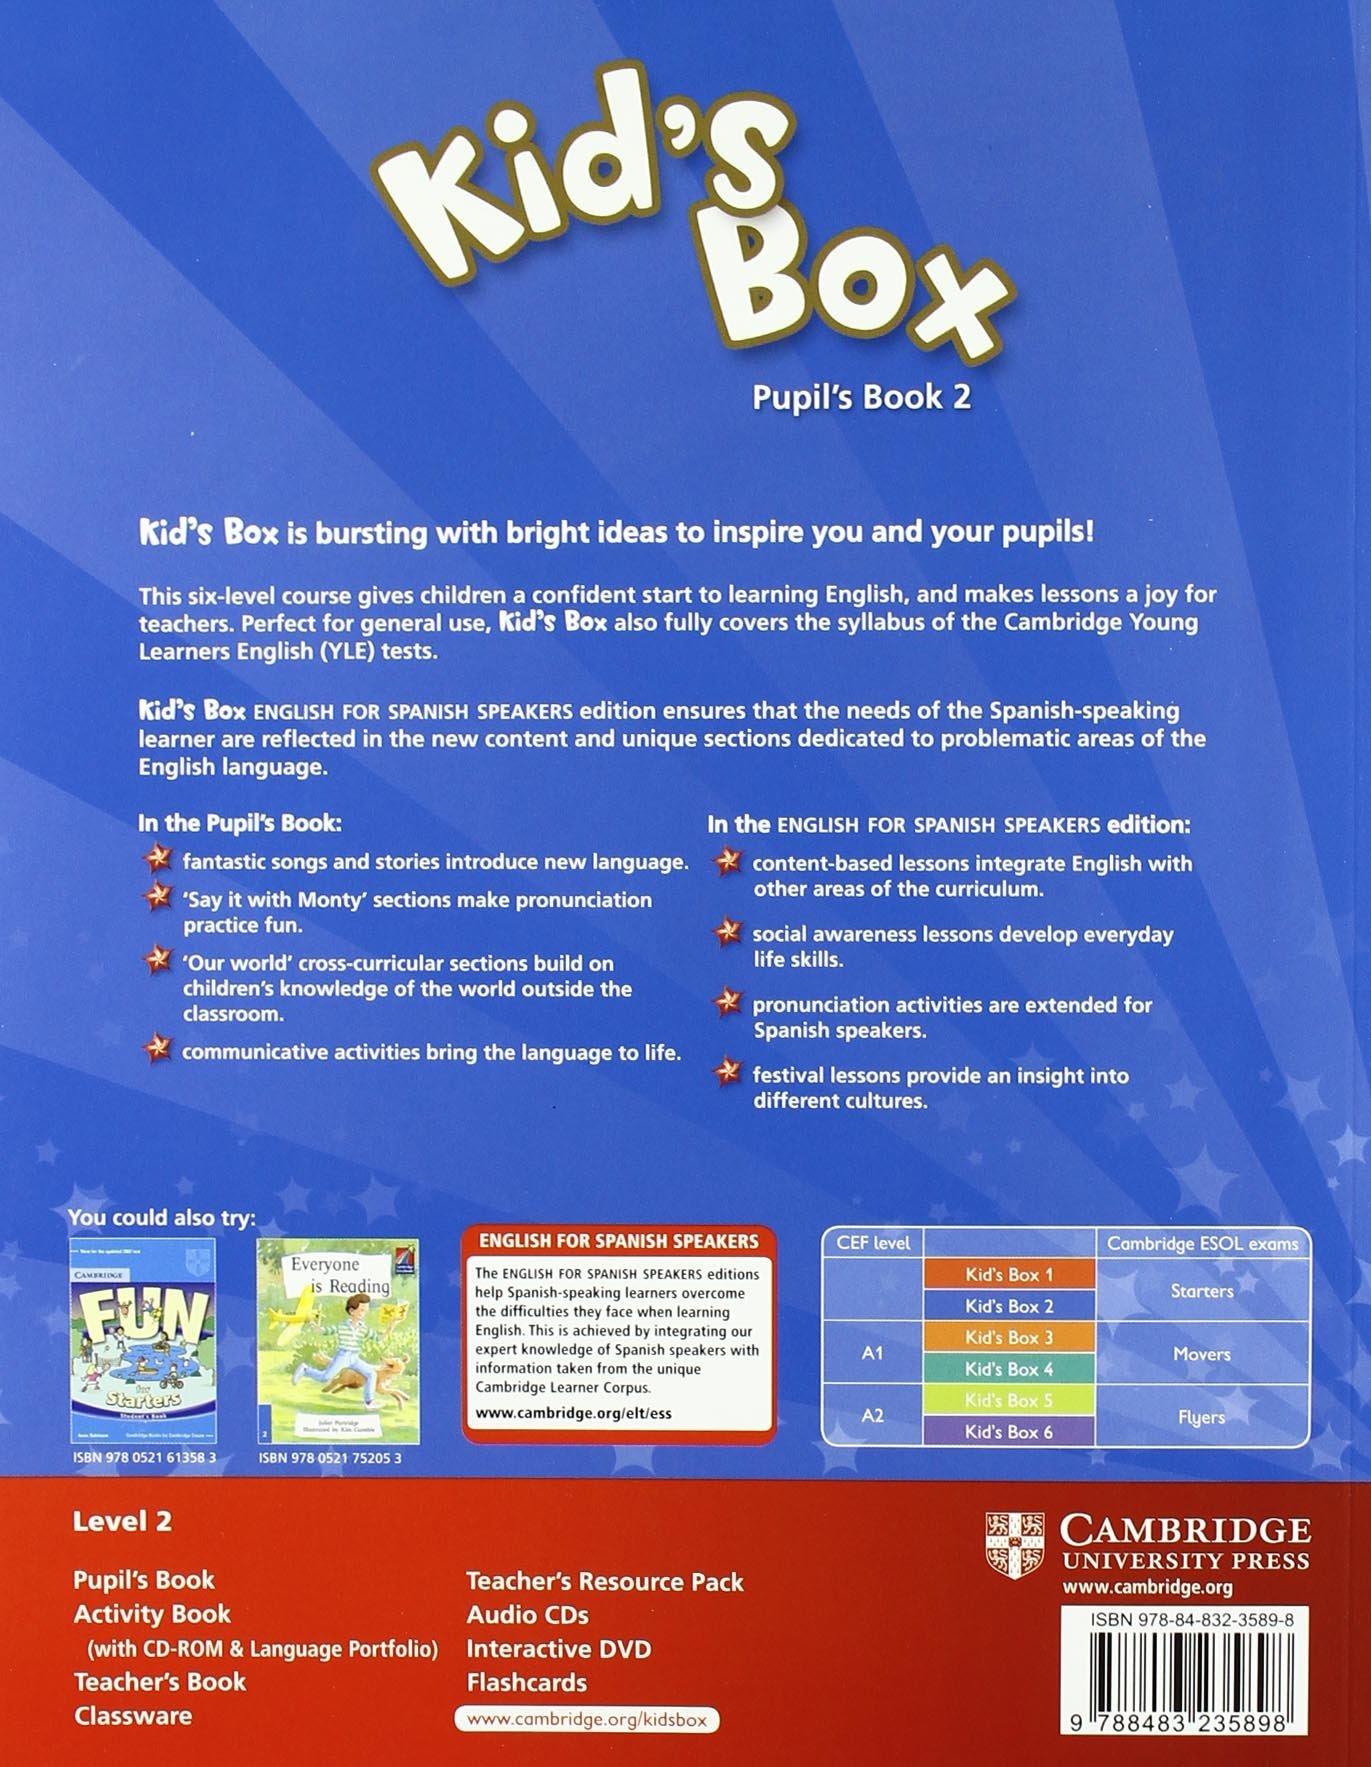 Kid's Box for Spanish Speakers 2 Pupil's Book - 9788483235898: Amazon.es:  Caroline Nixon, Michael Tomlinson: Libros en idiomas extranjeros